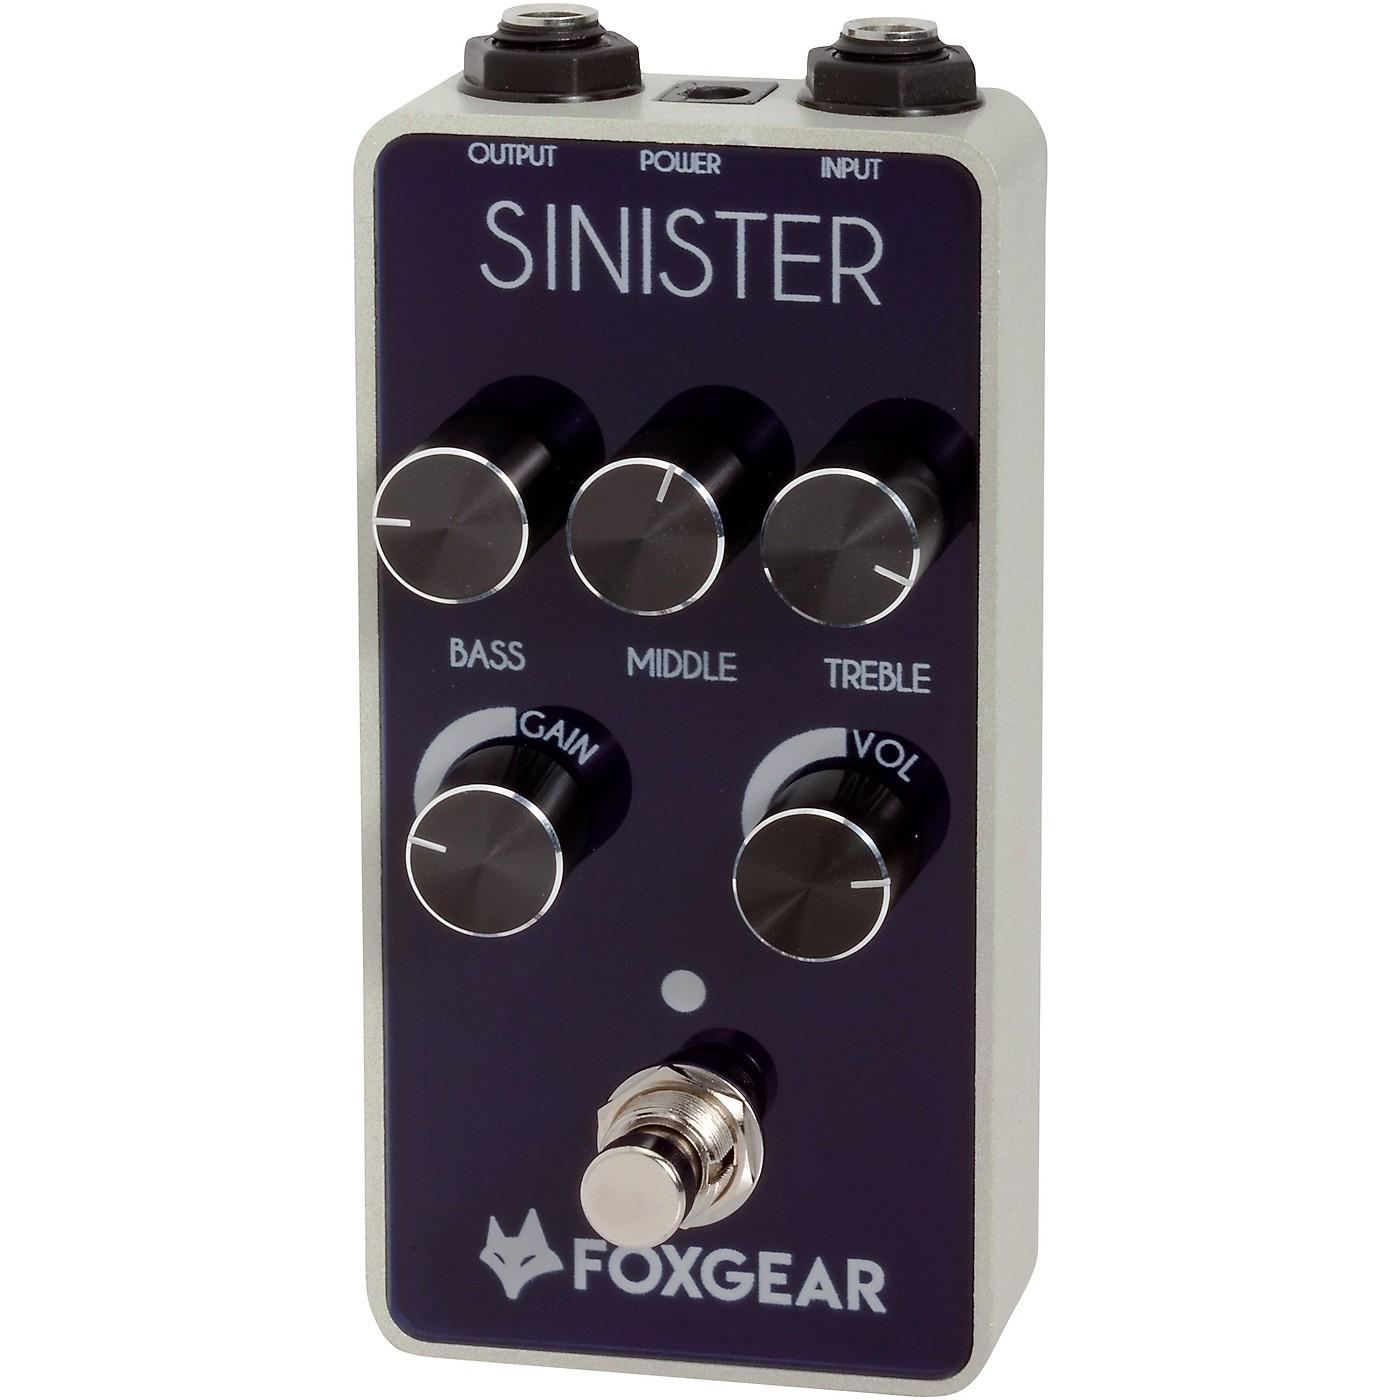 FoxGear Sinister FET Metal Distortion Effects Pedal thumbnail